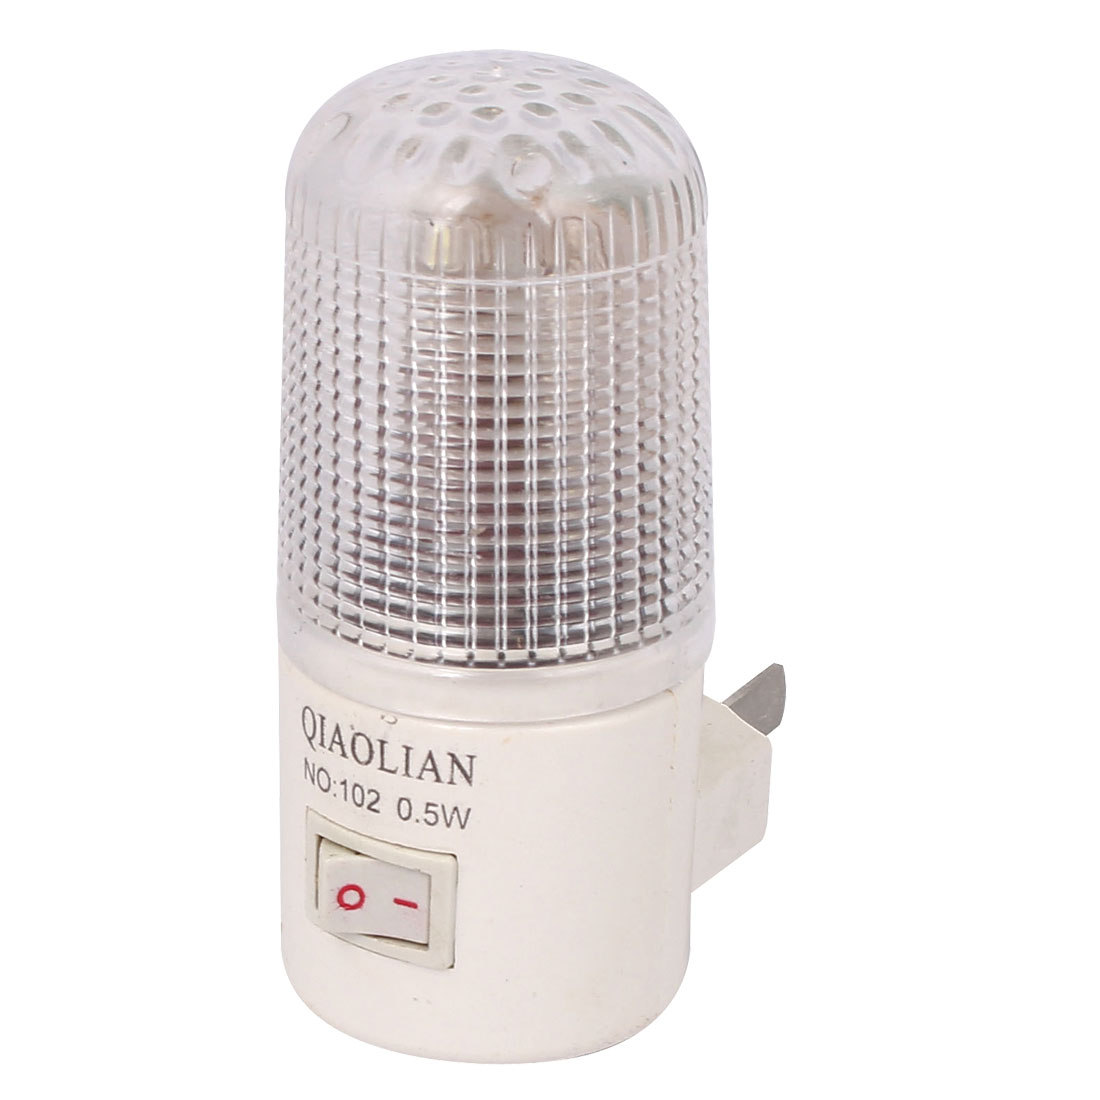 0.5W Bedroom Wall Mounting Night Lamp Light Bulb US Plug 110V-250V